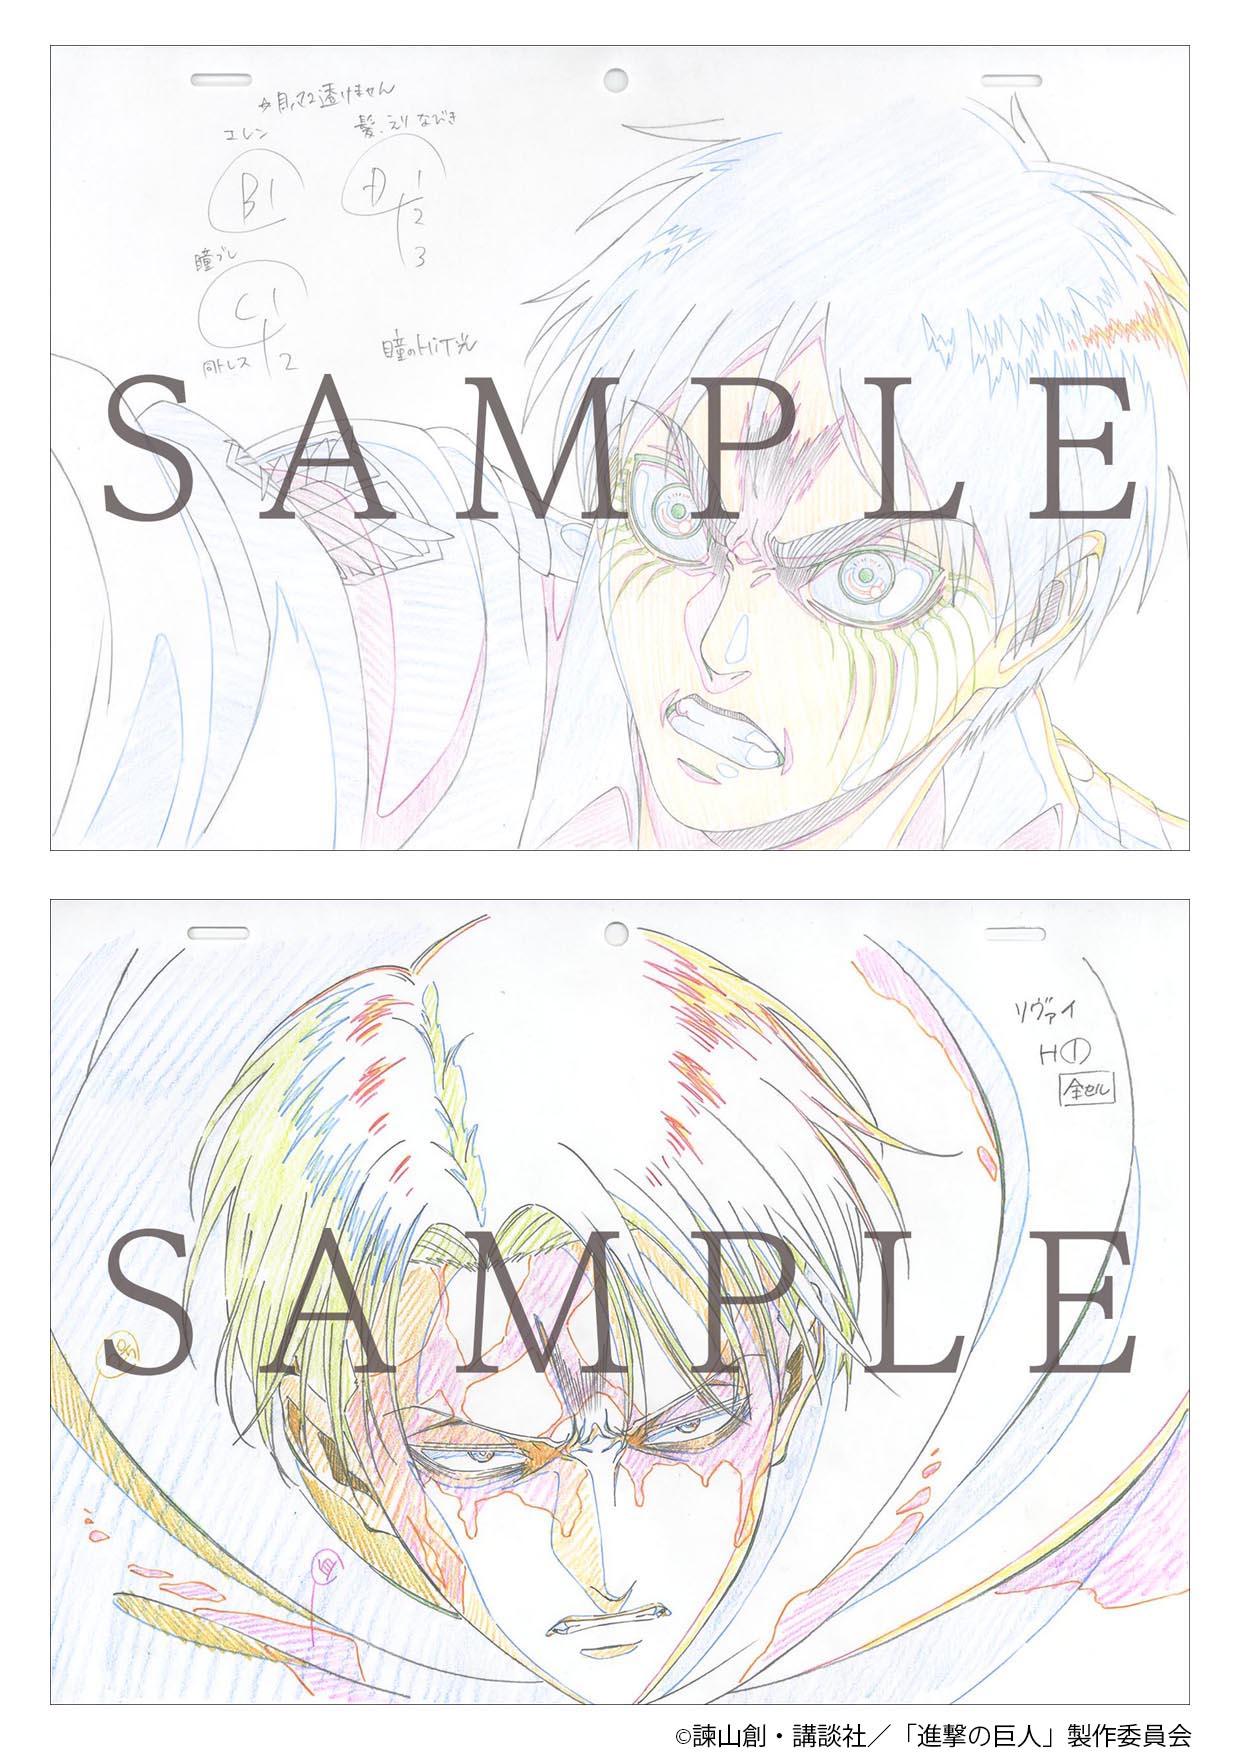 「進撃の巨人」新刊3冊のC97先行販売&店舗特典情報を公開!